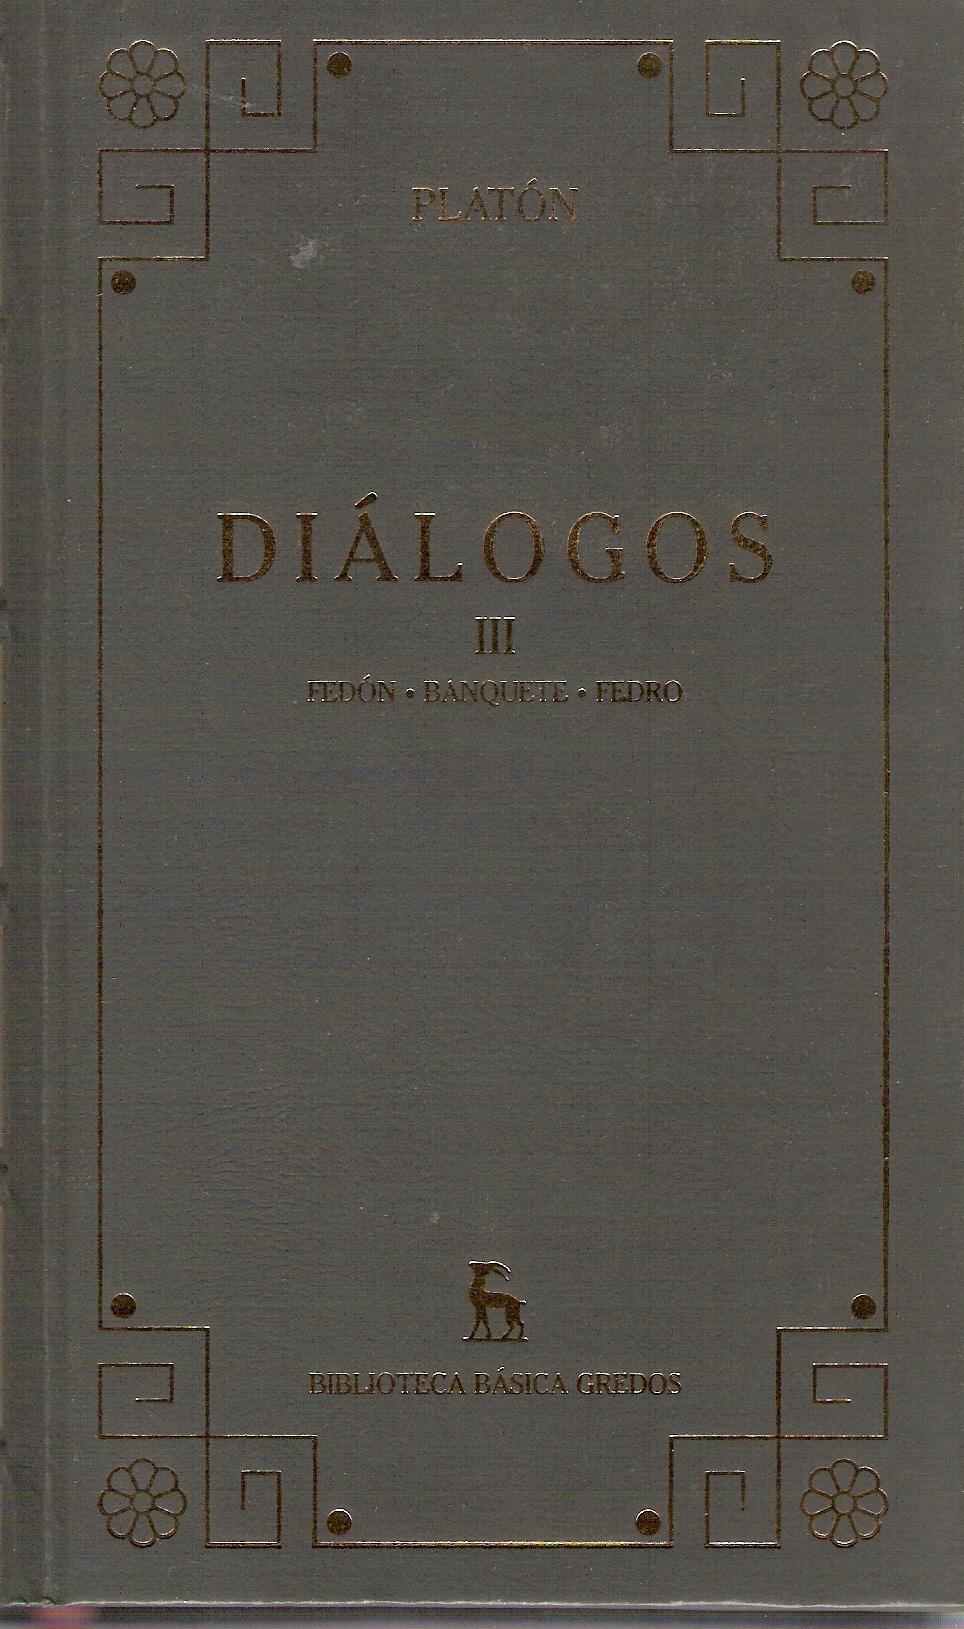 Diálogos III